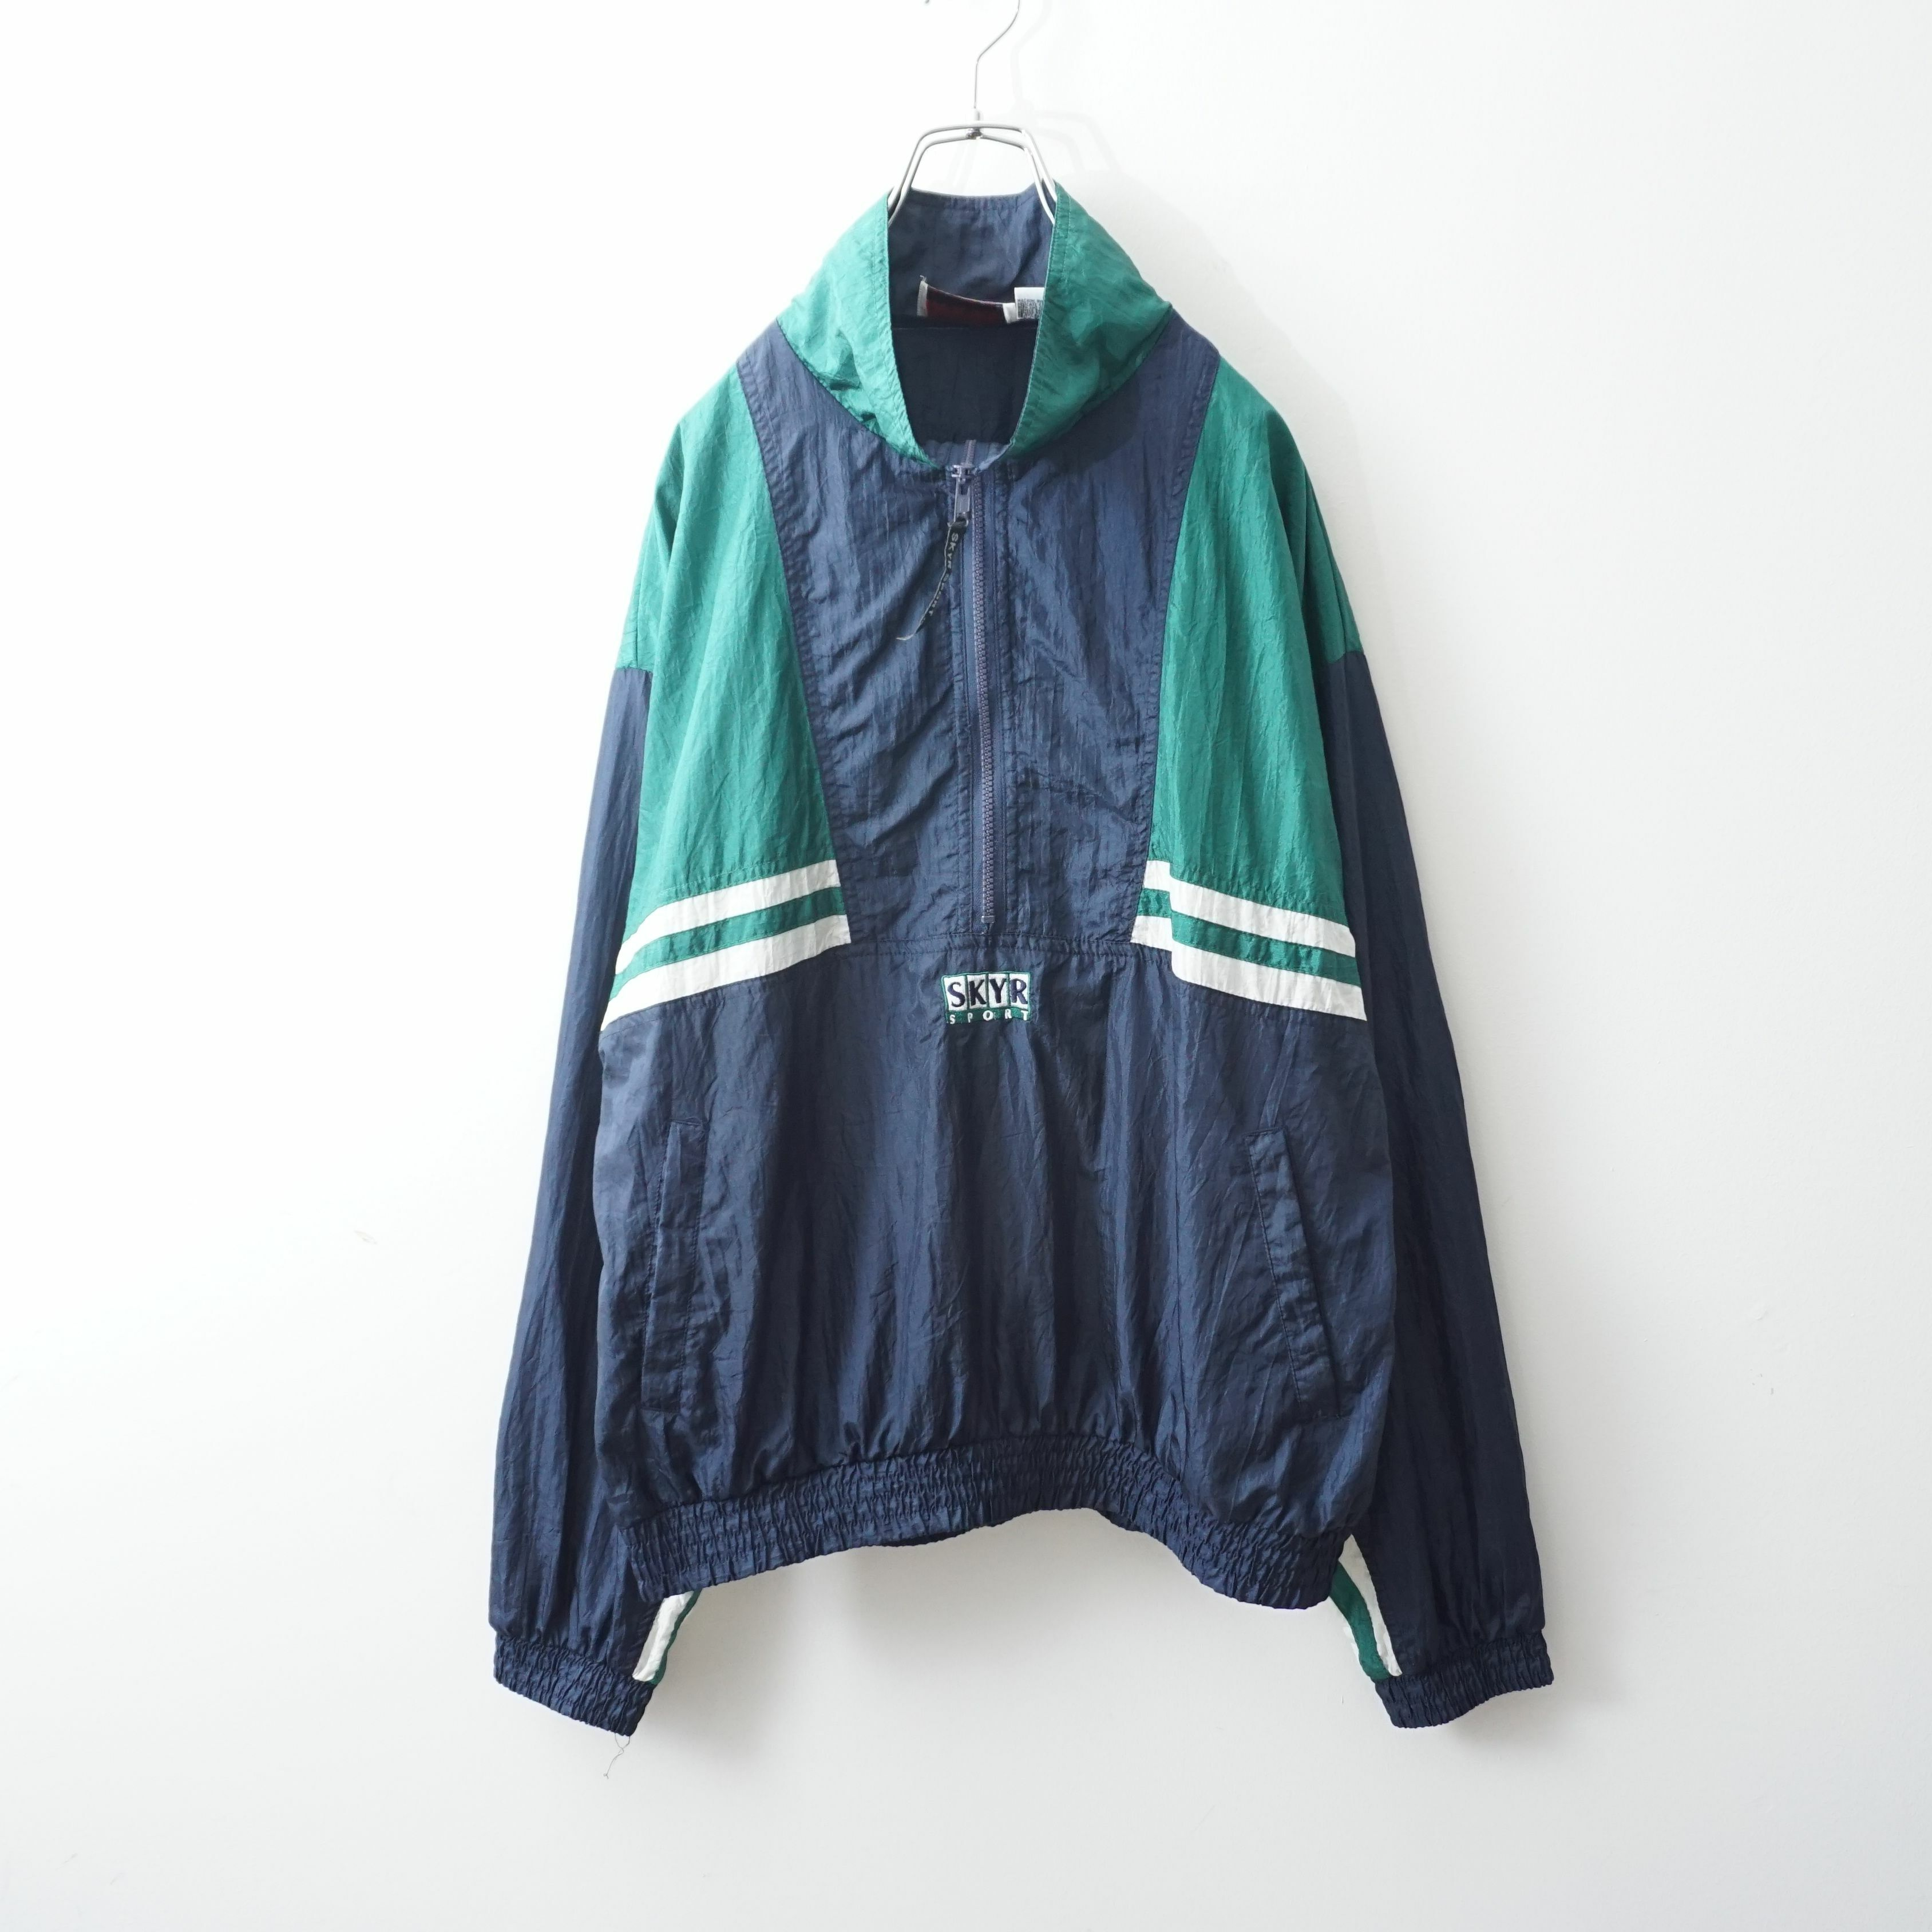 SKYR sport multi-color anorak jacket